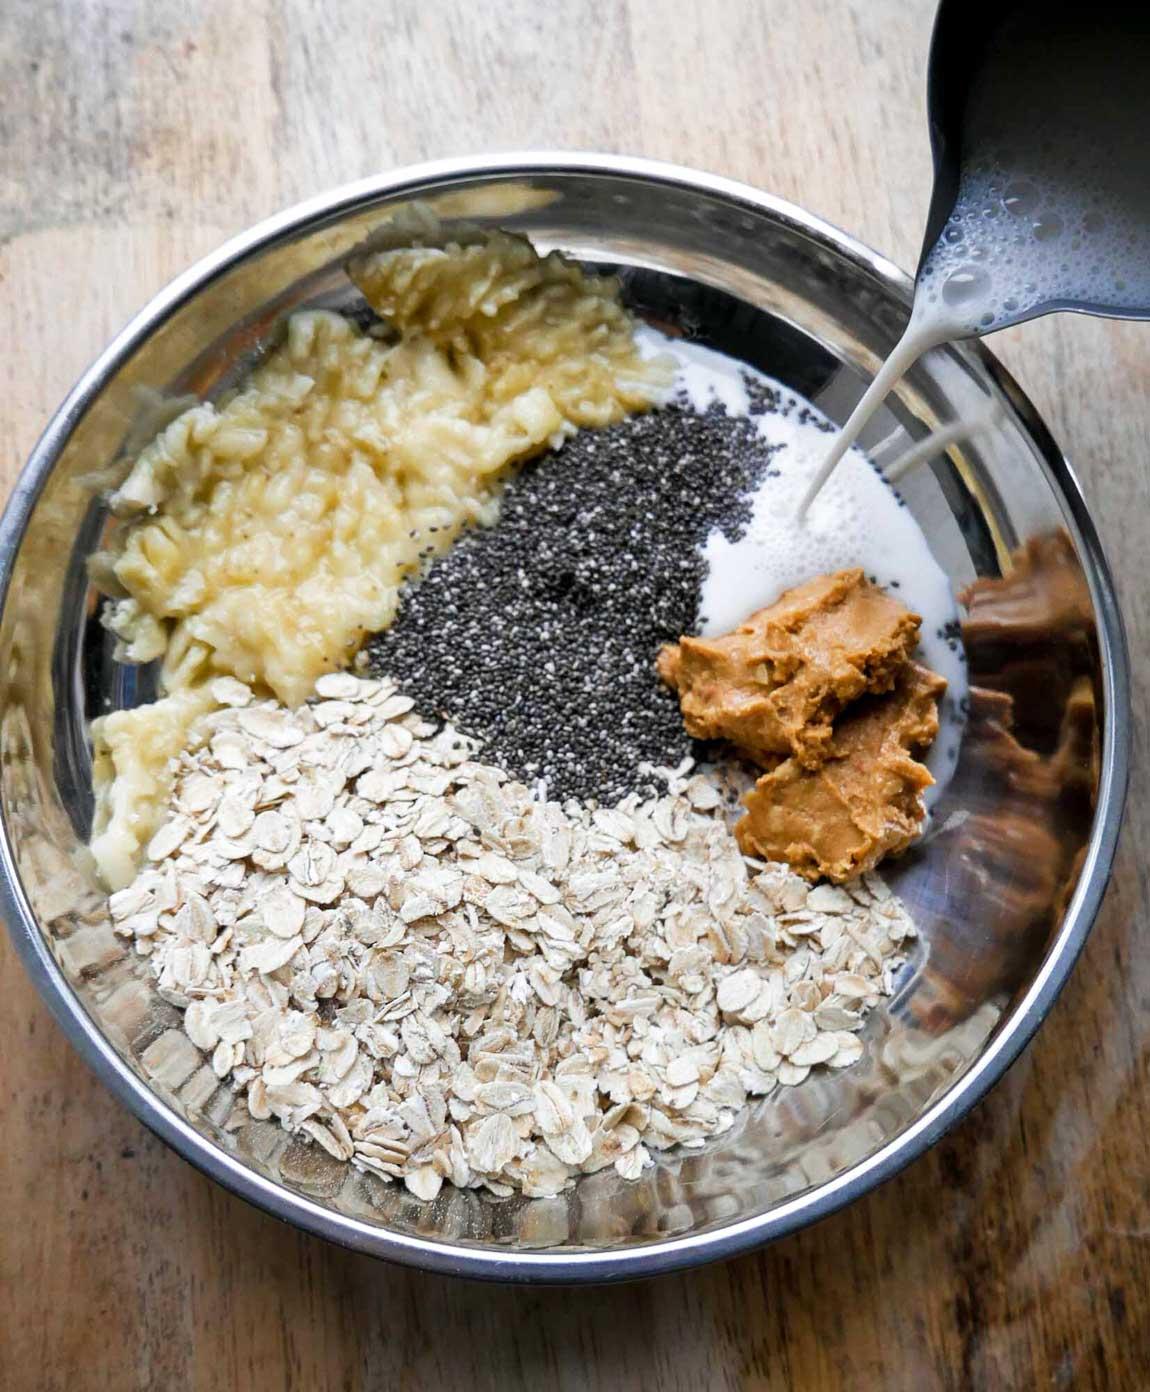 chiagrød med bananer, peanut butter og havregryn